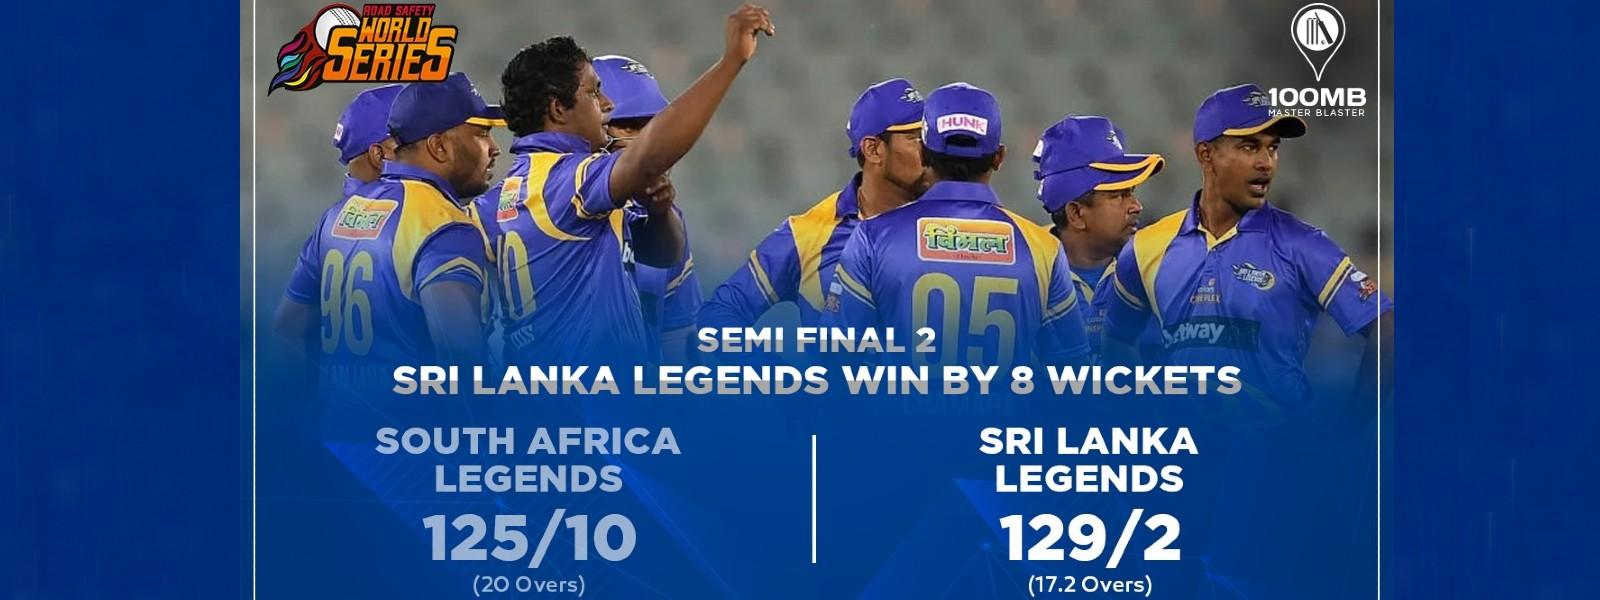 Sri Lanka Legends crush South Africa Legends; will meet India Legends in Final